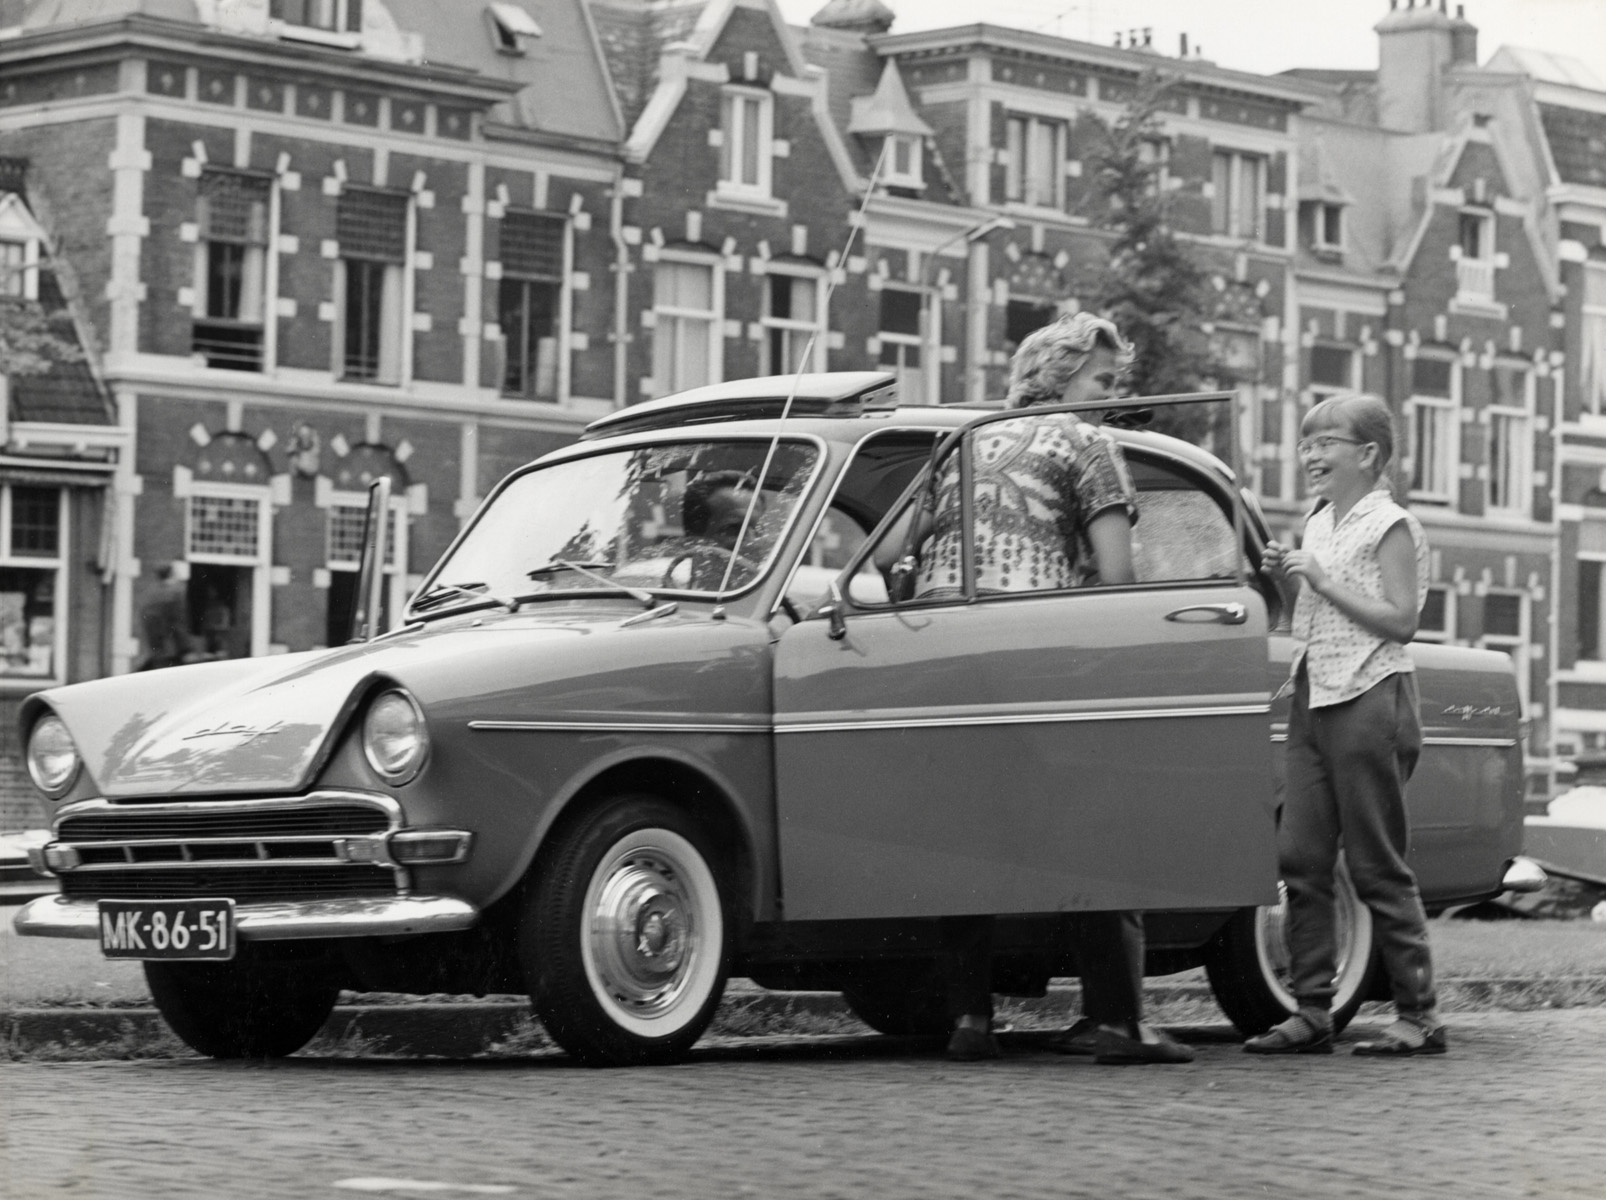 gezin van spaarnestad fotolaborant bert stuifbergen stapt in auto daf nederland jaren 39 60. Black Bedroom Furniture Sets. Home Design Ideas